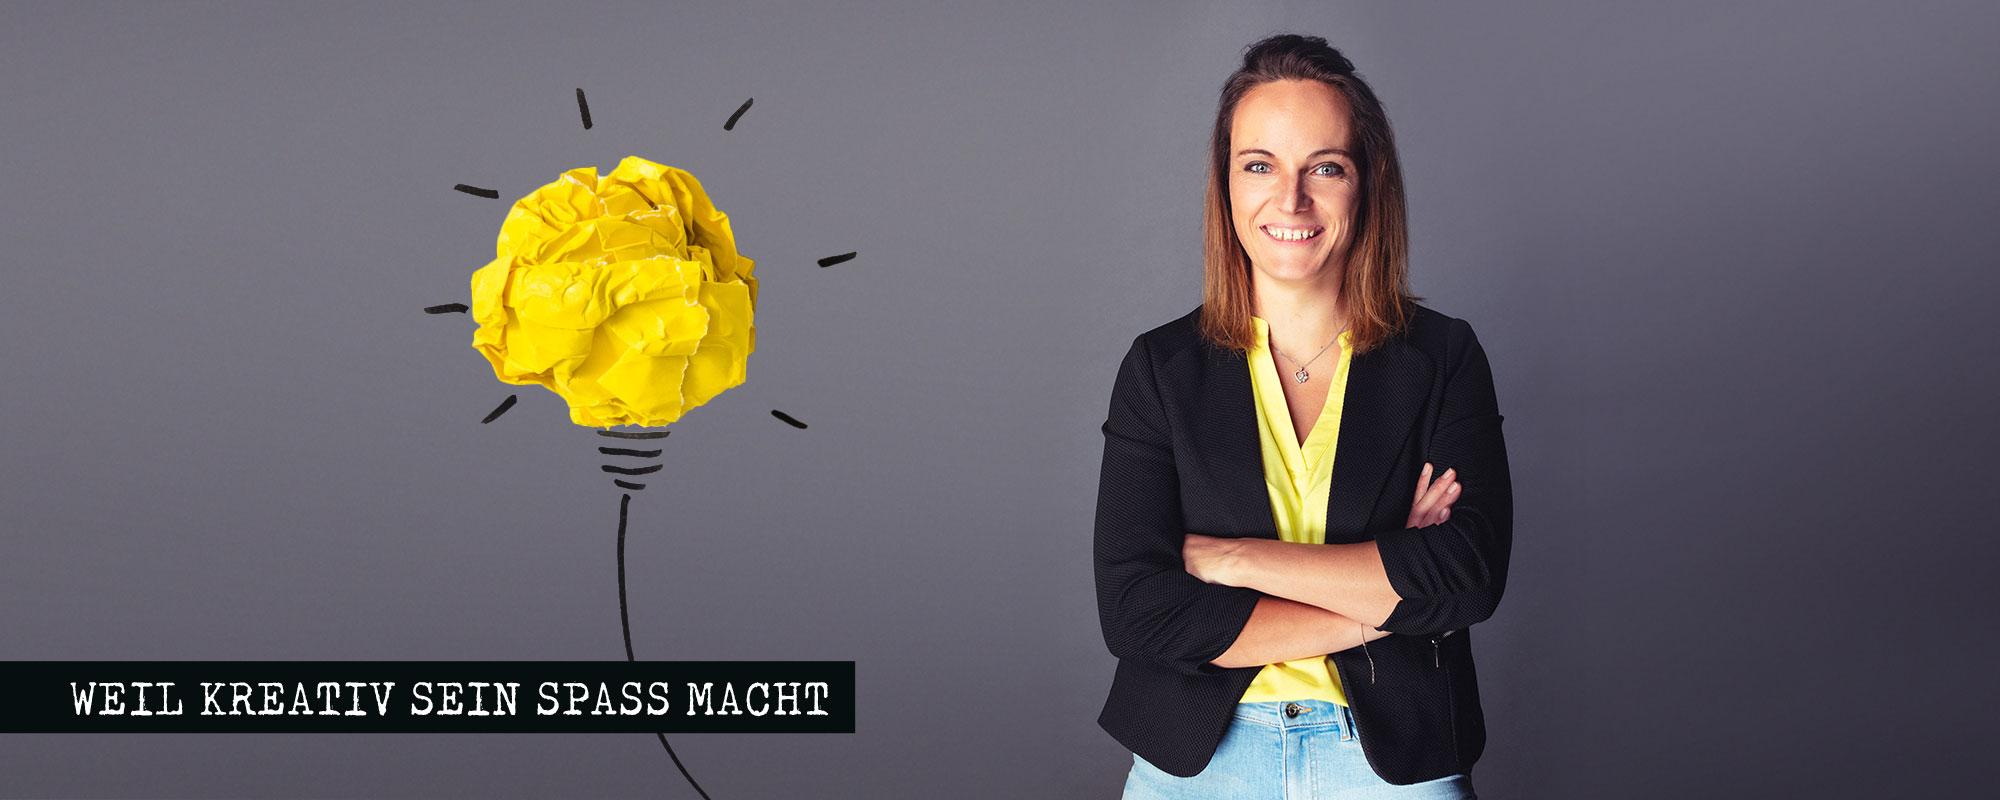 Anja Moser - Weil kreativ sein Spaß macht - Das Kreativbüro